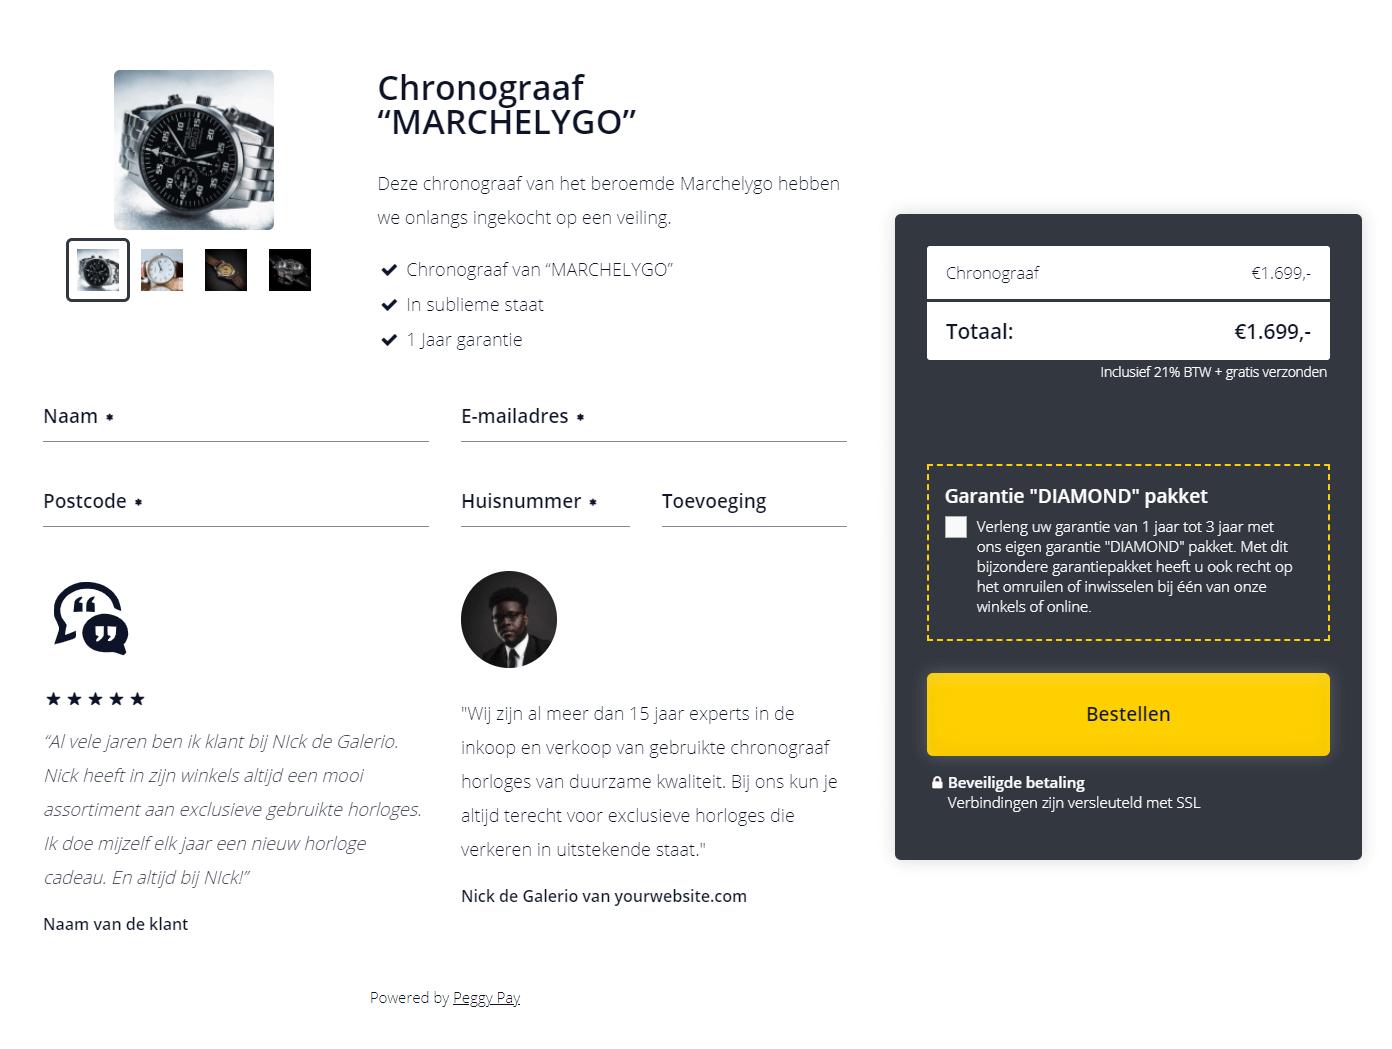 Betaalpagina met ideal - Chronograaf horloge